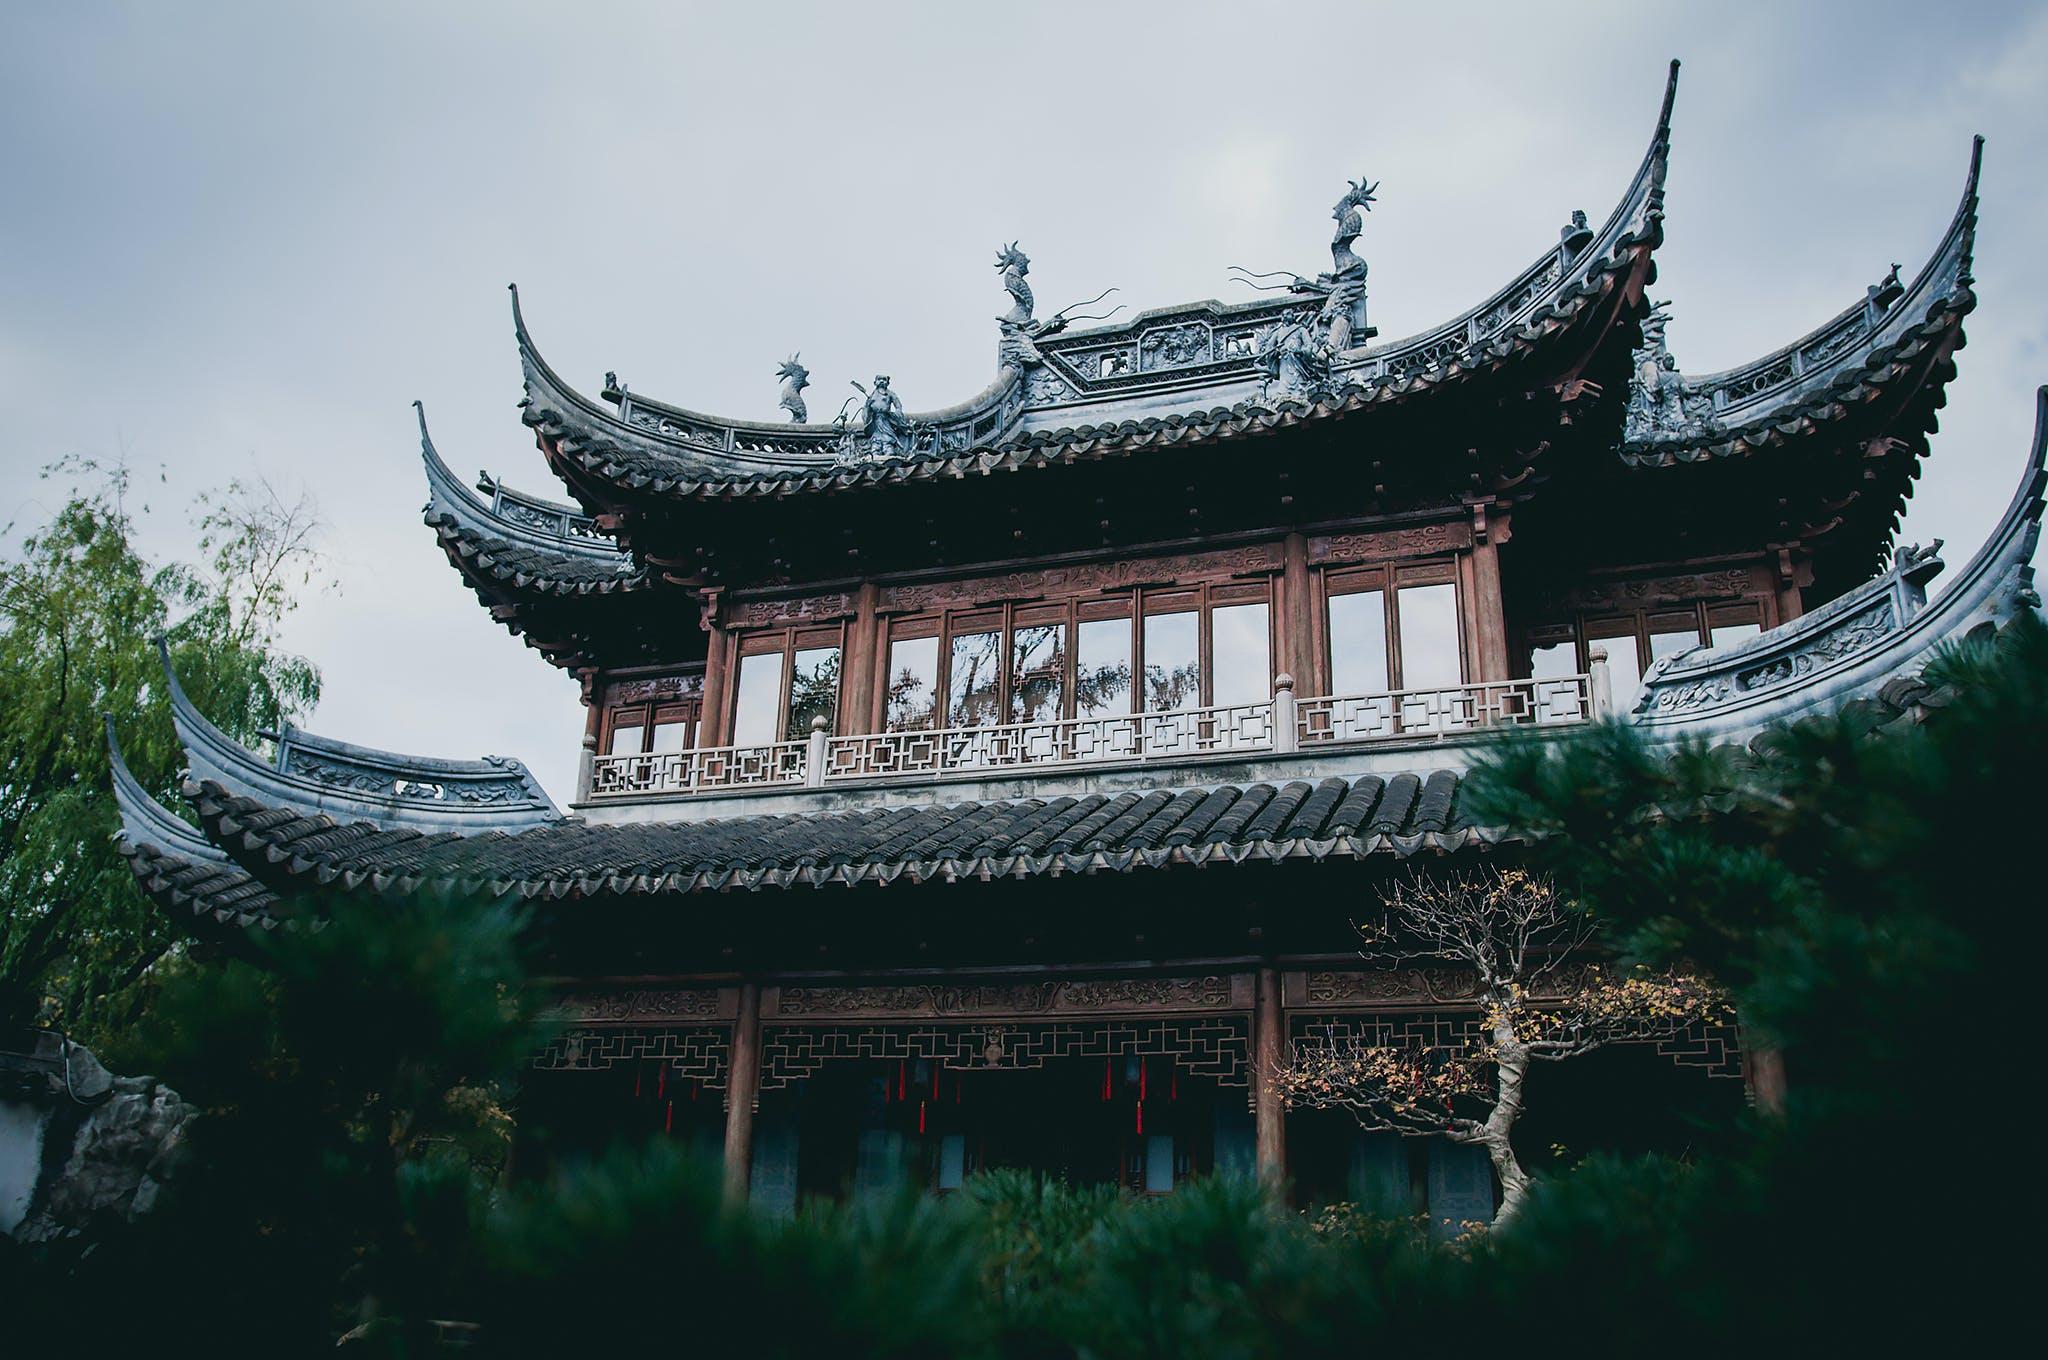 Kostnadsfri bild av arkitektur, drake, gammal, glasfönster